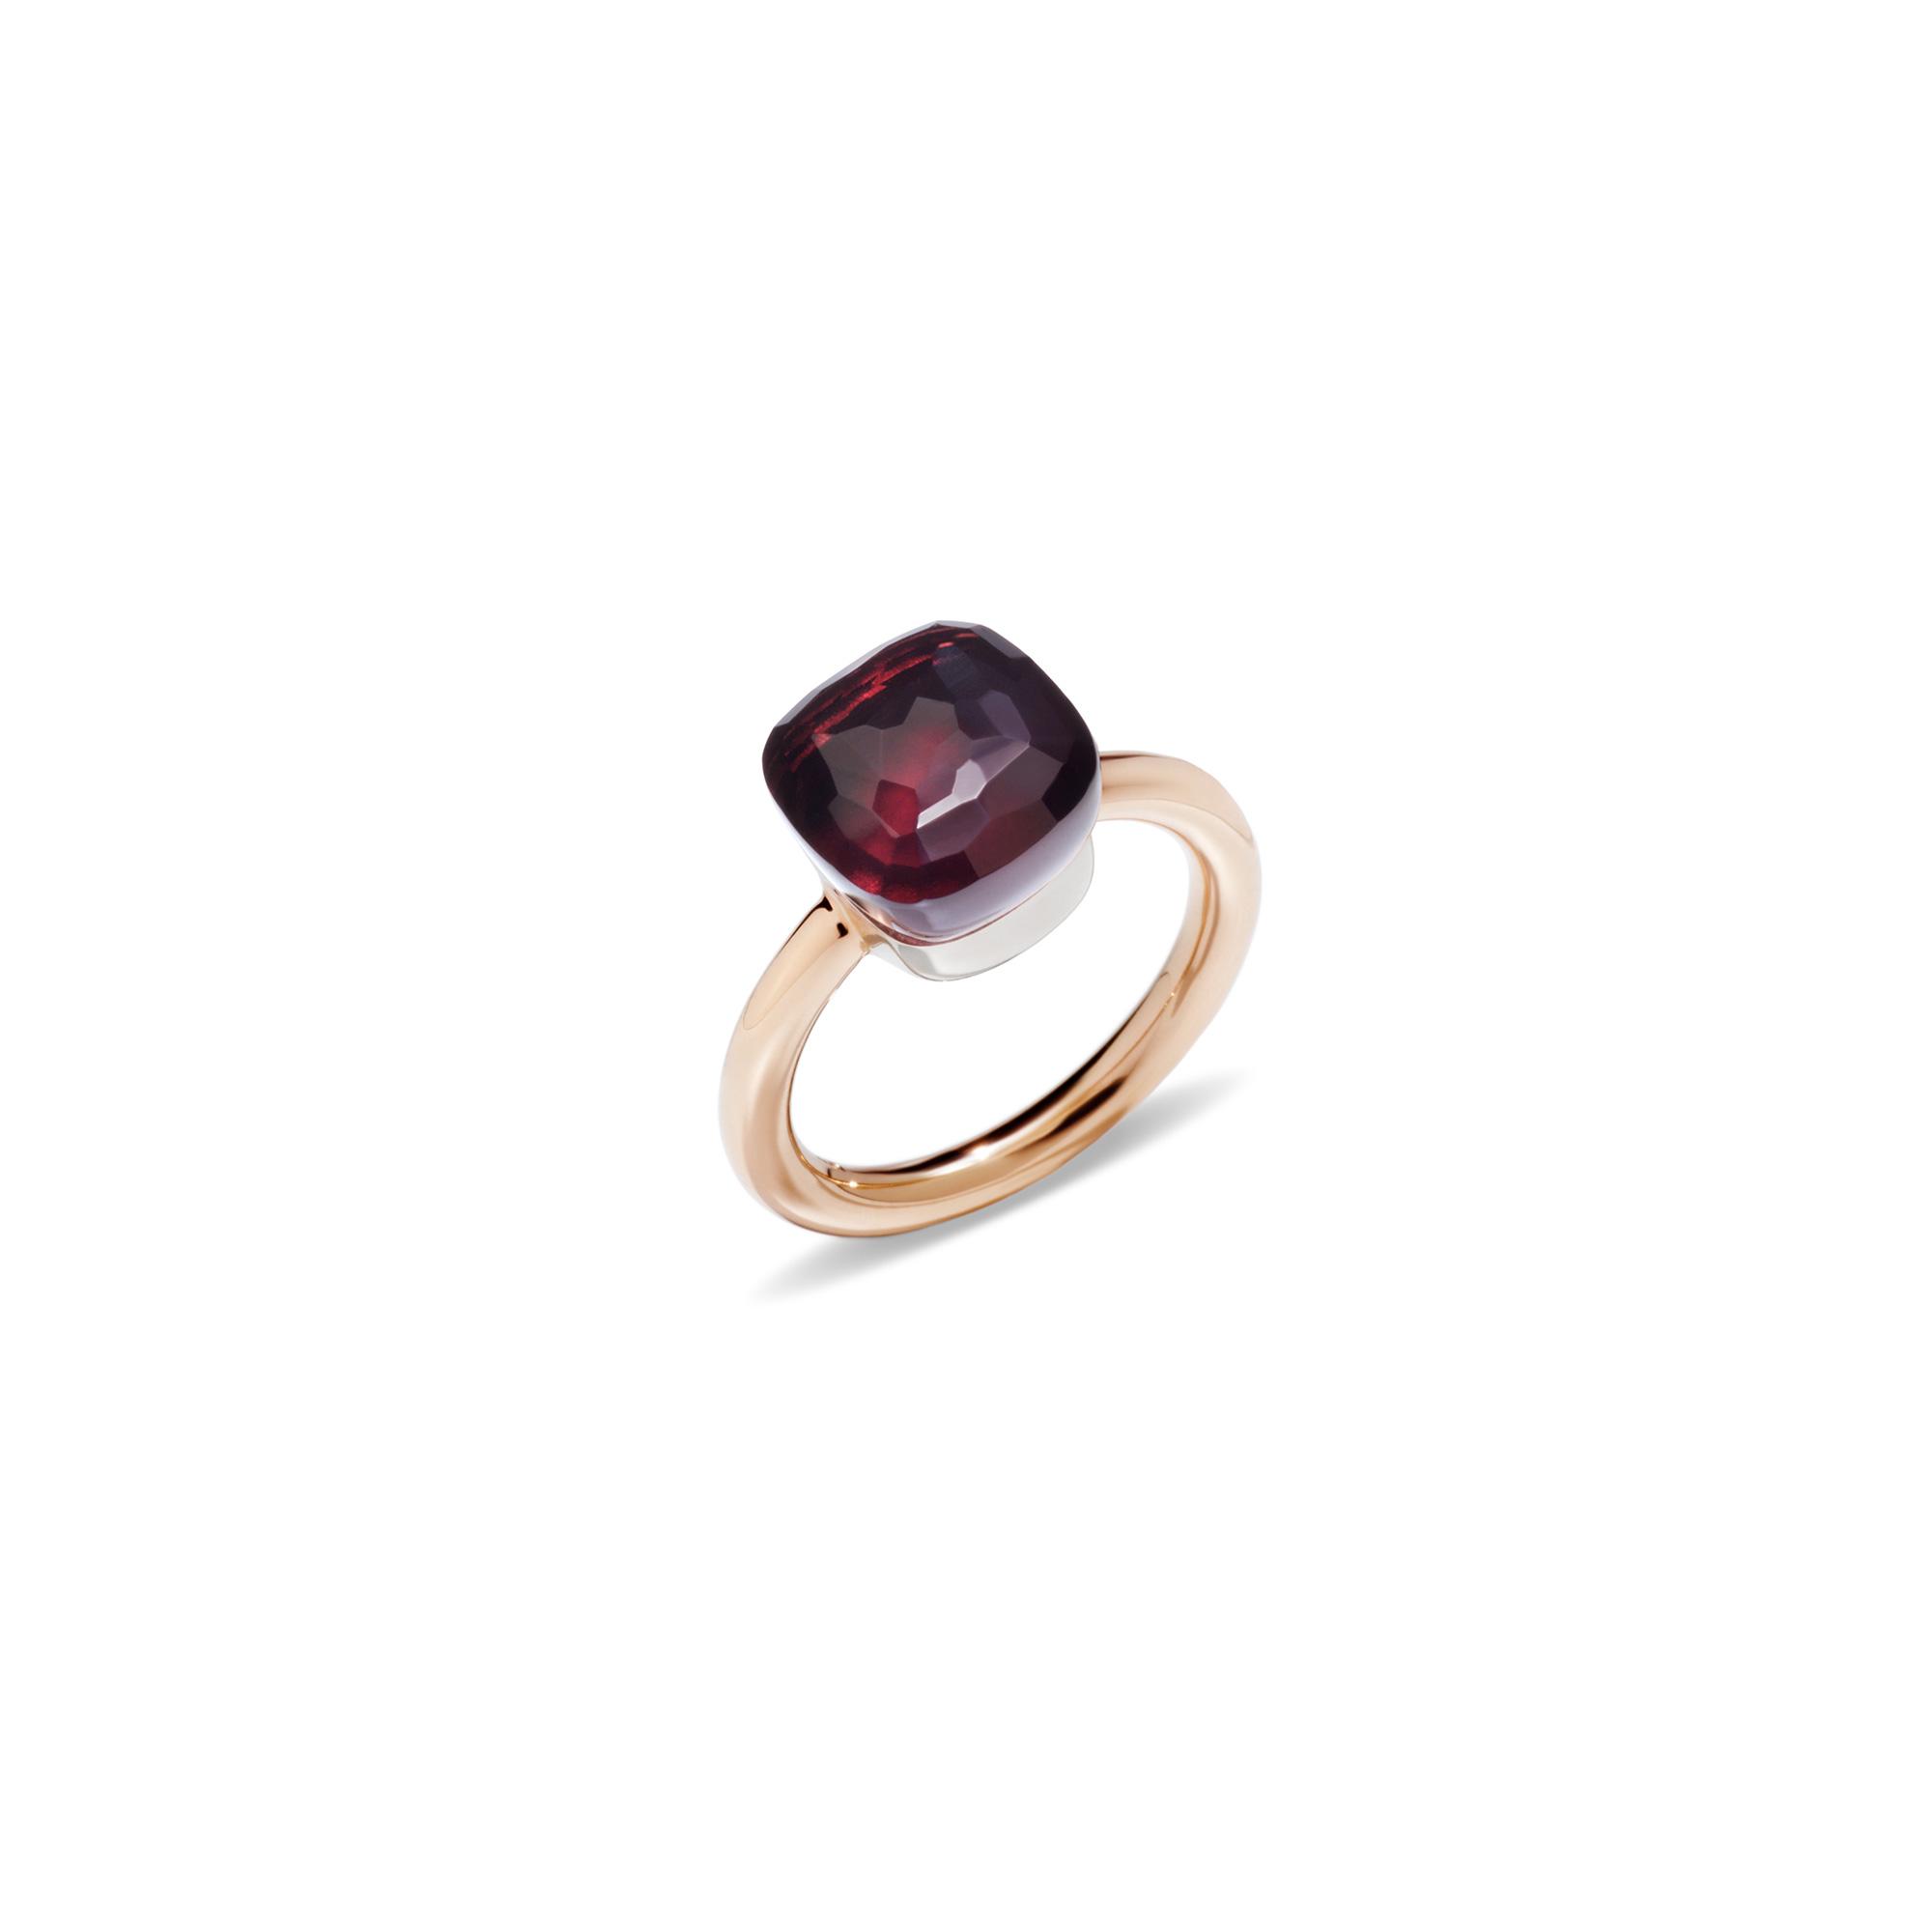 Pomellato Nudo Ring aus Roségold mit Granat